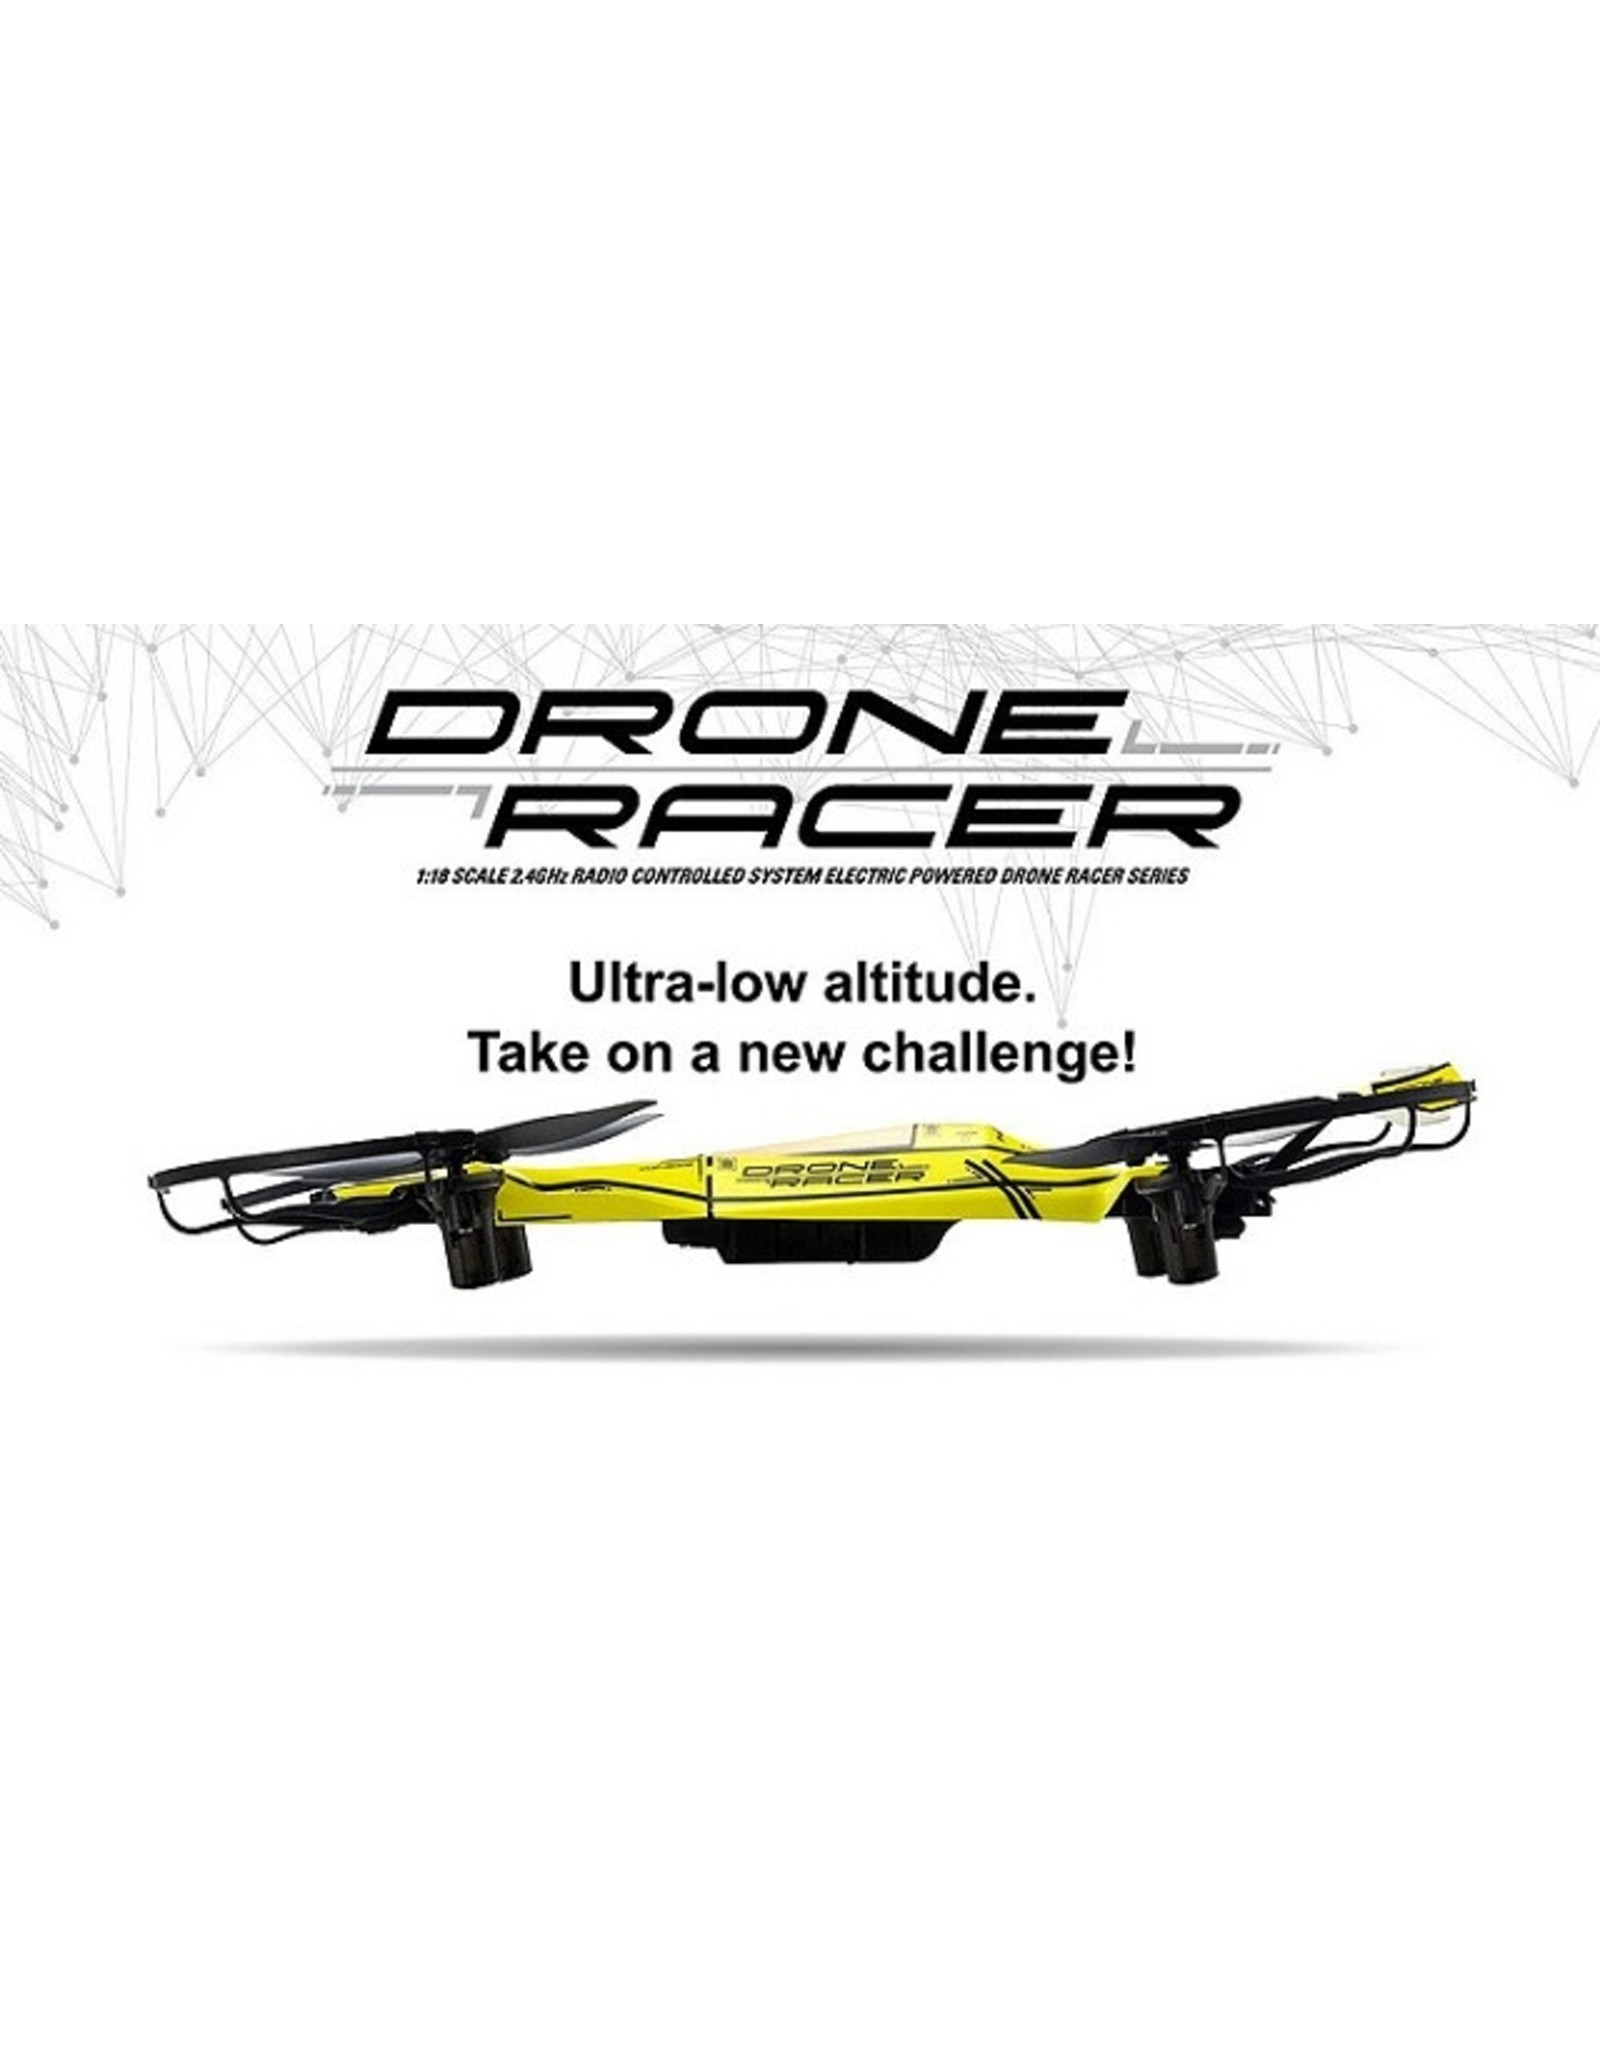 Kyosho DRONE RACER Smashing Yellow ZEPHYR RS